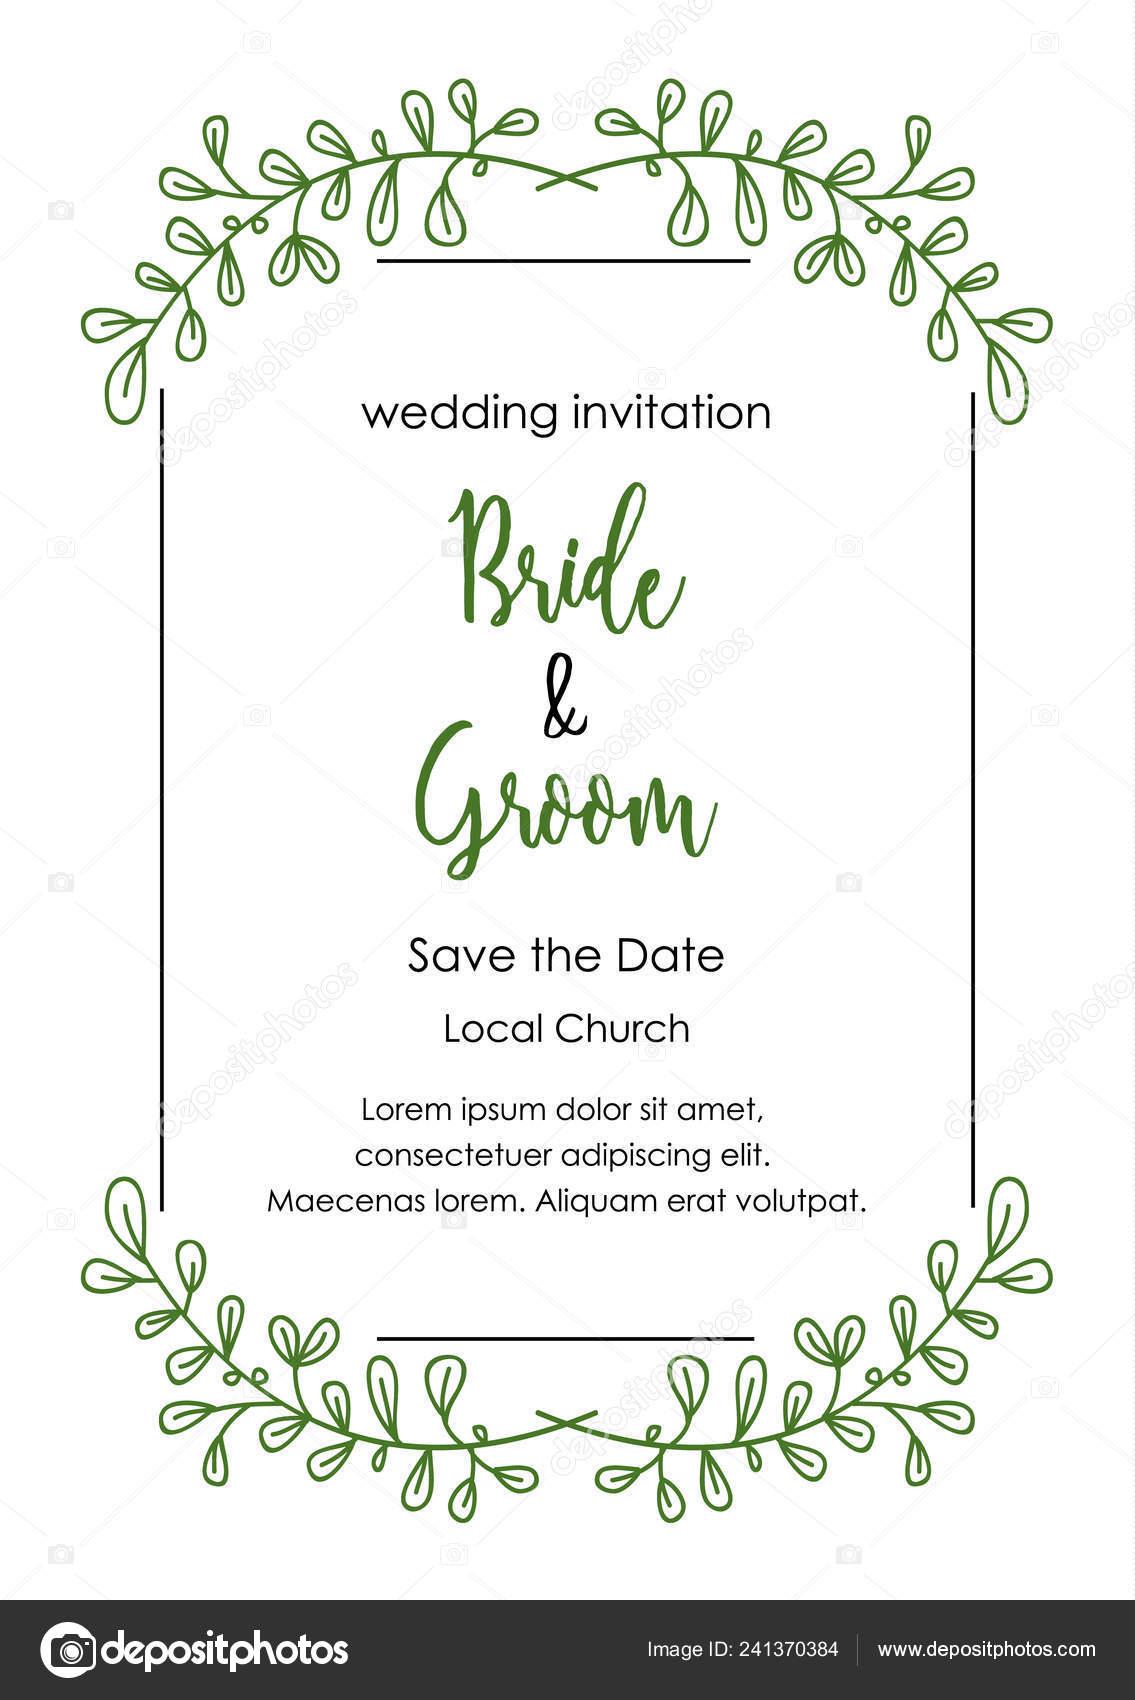 wedding invitation card wedding card template decorative floral frame hand vector image by c kiki vagnerova gmail com vector stock 241370384